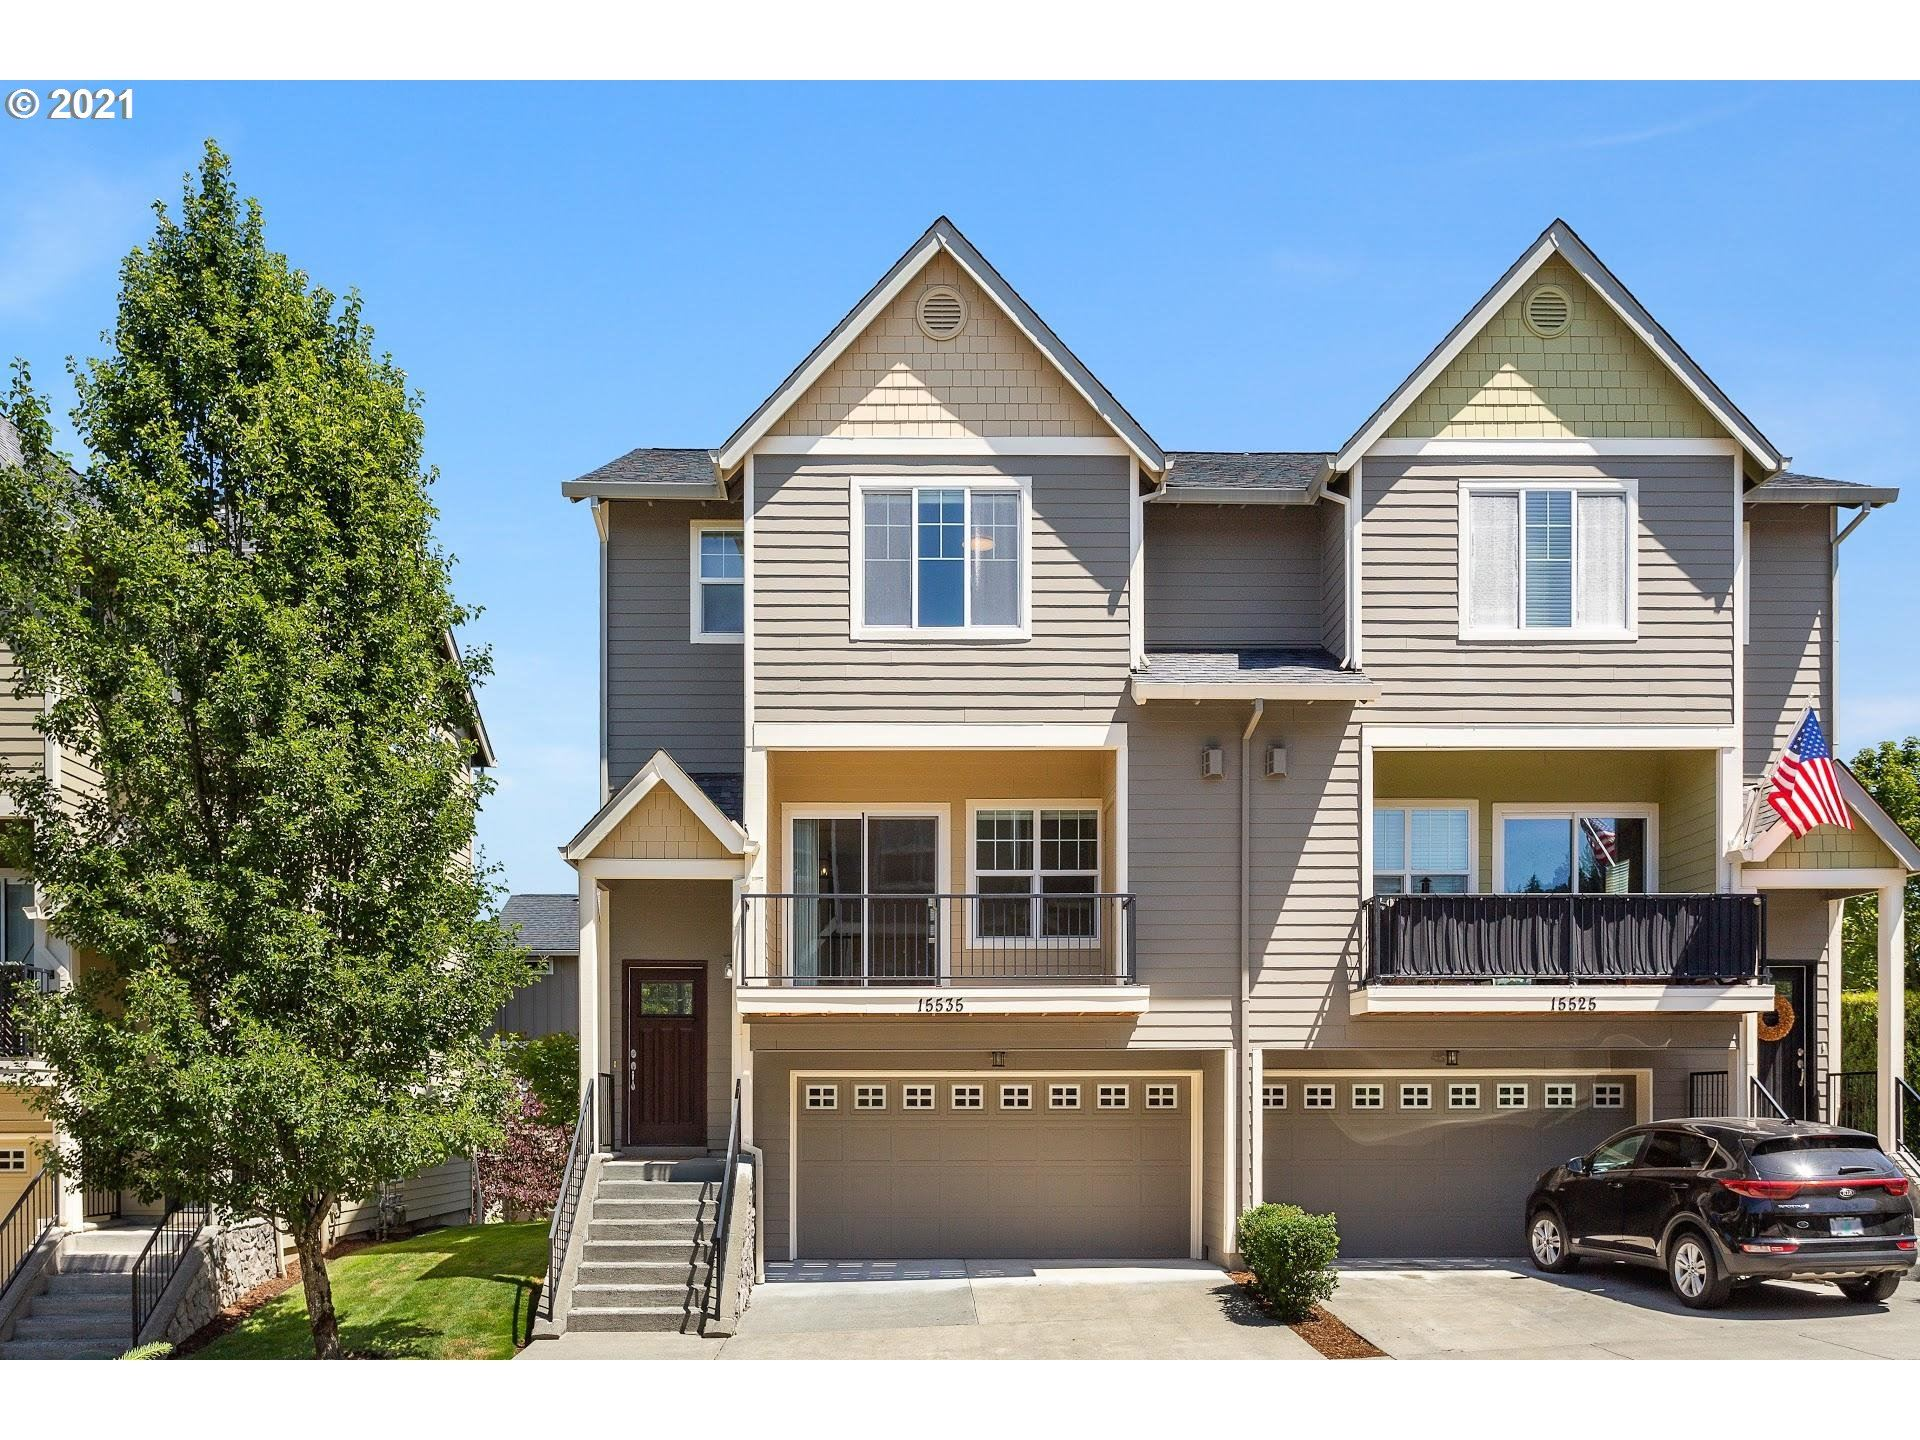 15535 SW IVORY ST, Beaverton, OR 97007 - MLS#: 21316301